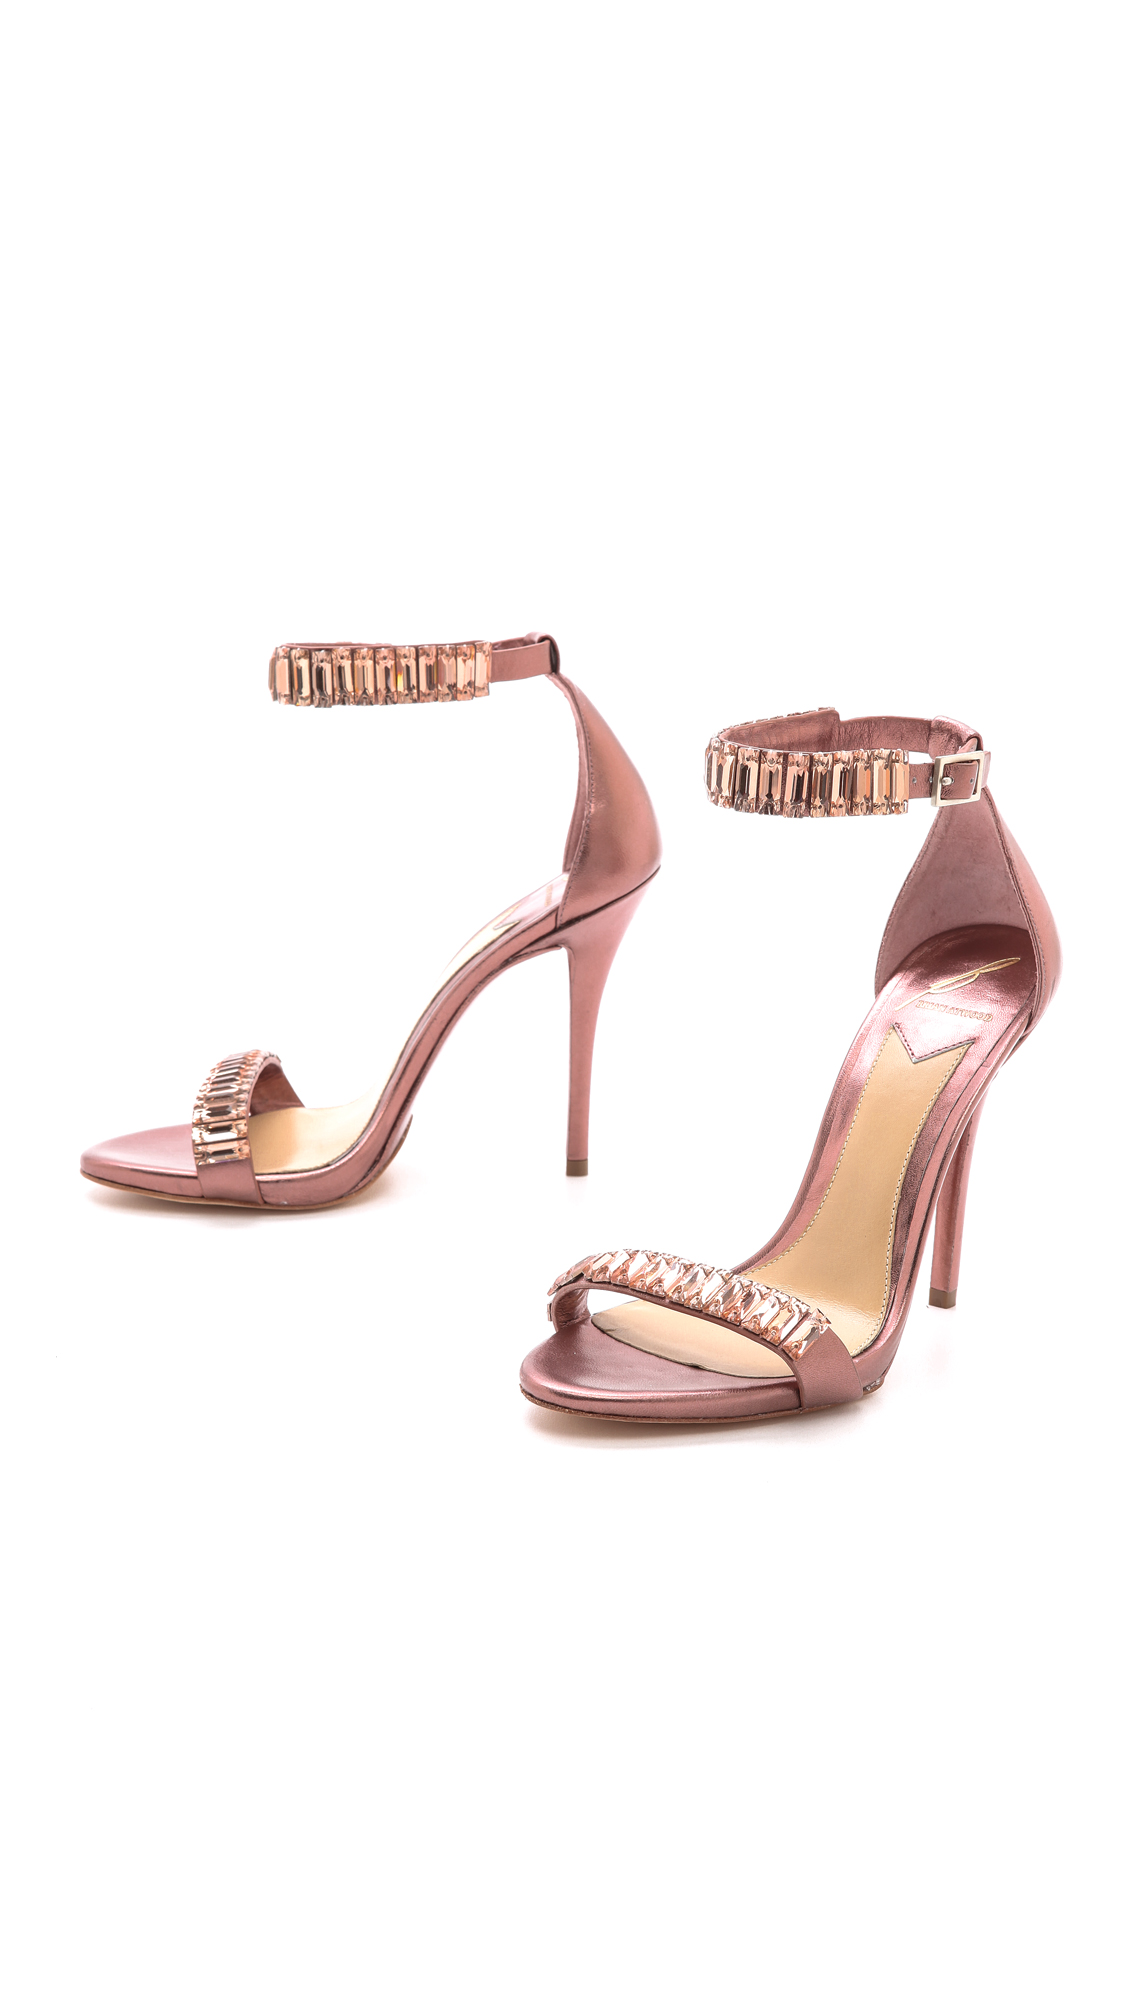 81bbf2cb734 B Brian Atwood Ciara Jeweled Sandals   SHOPBOP